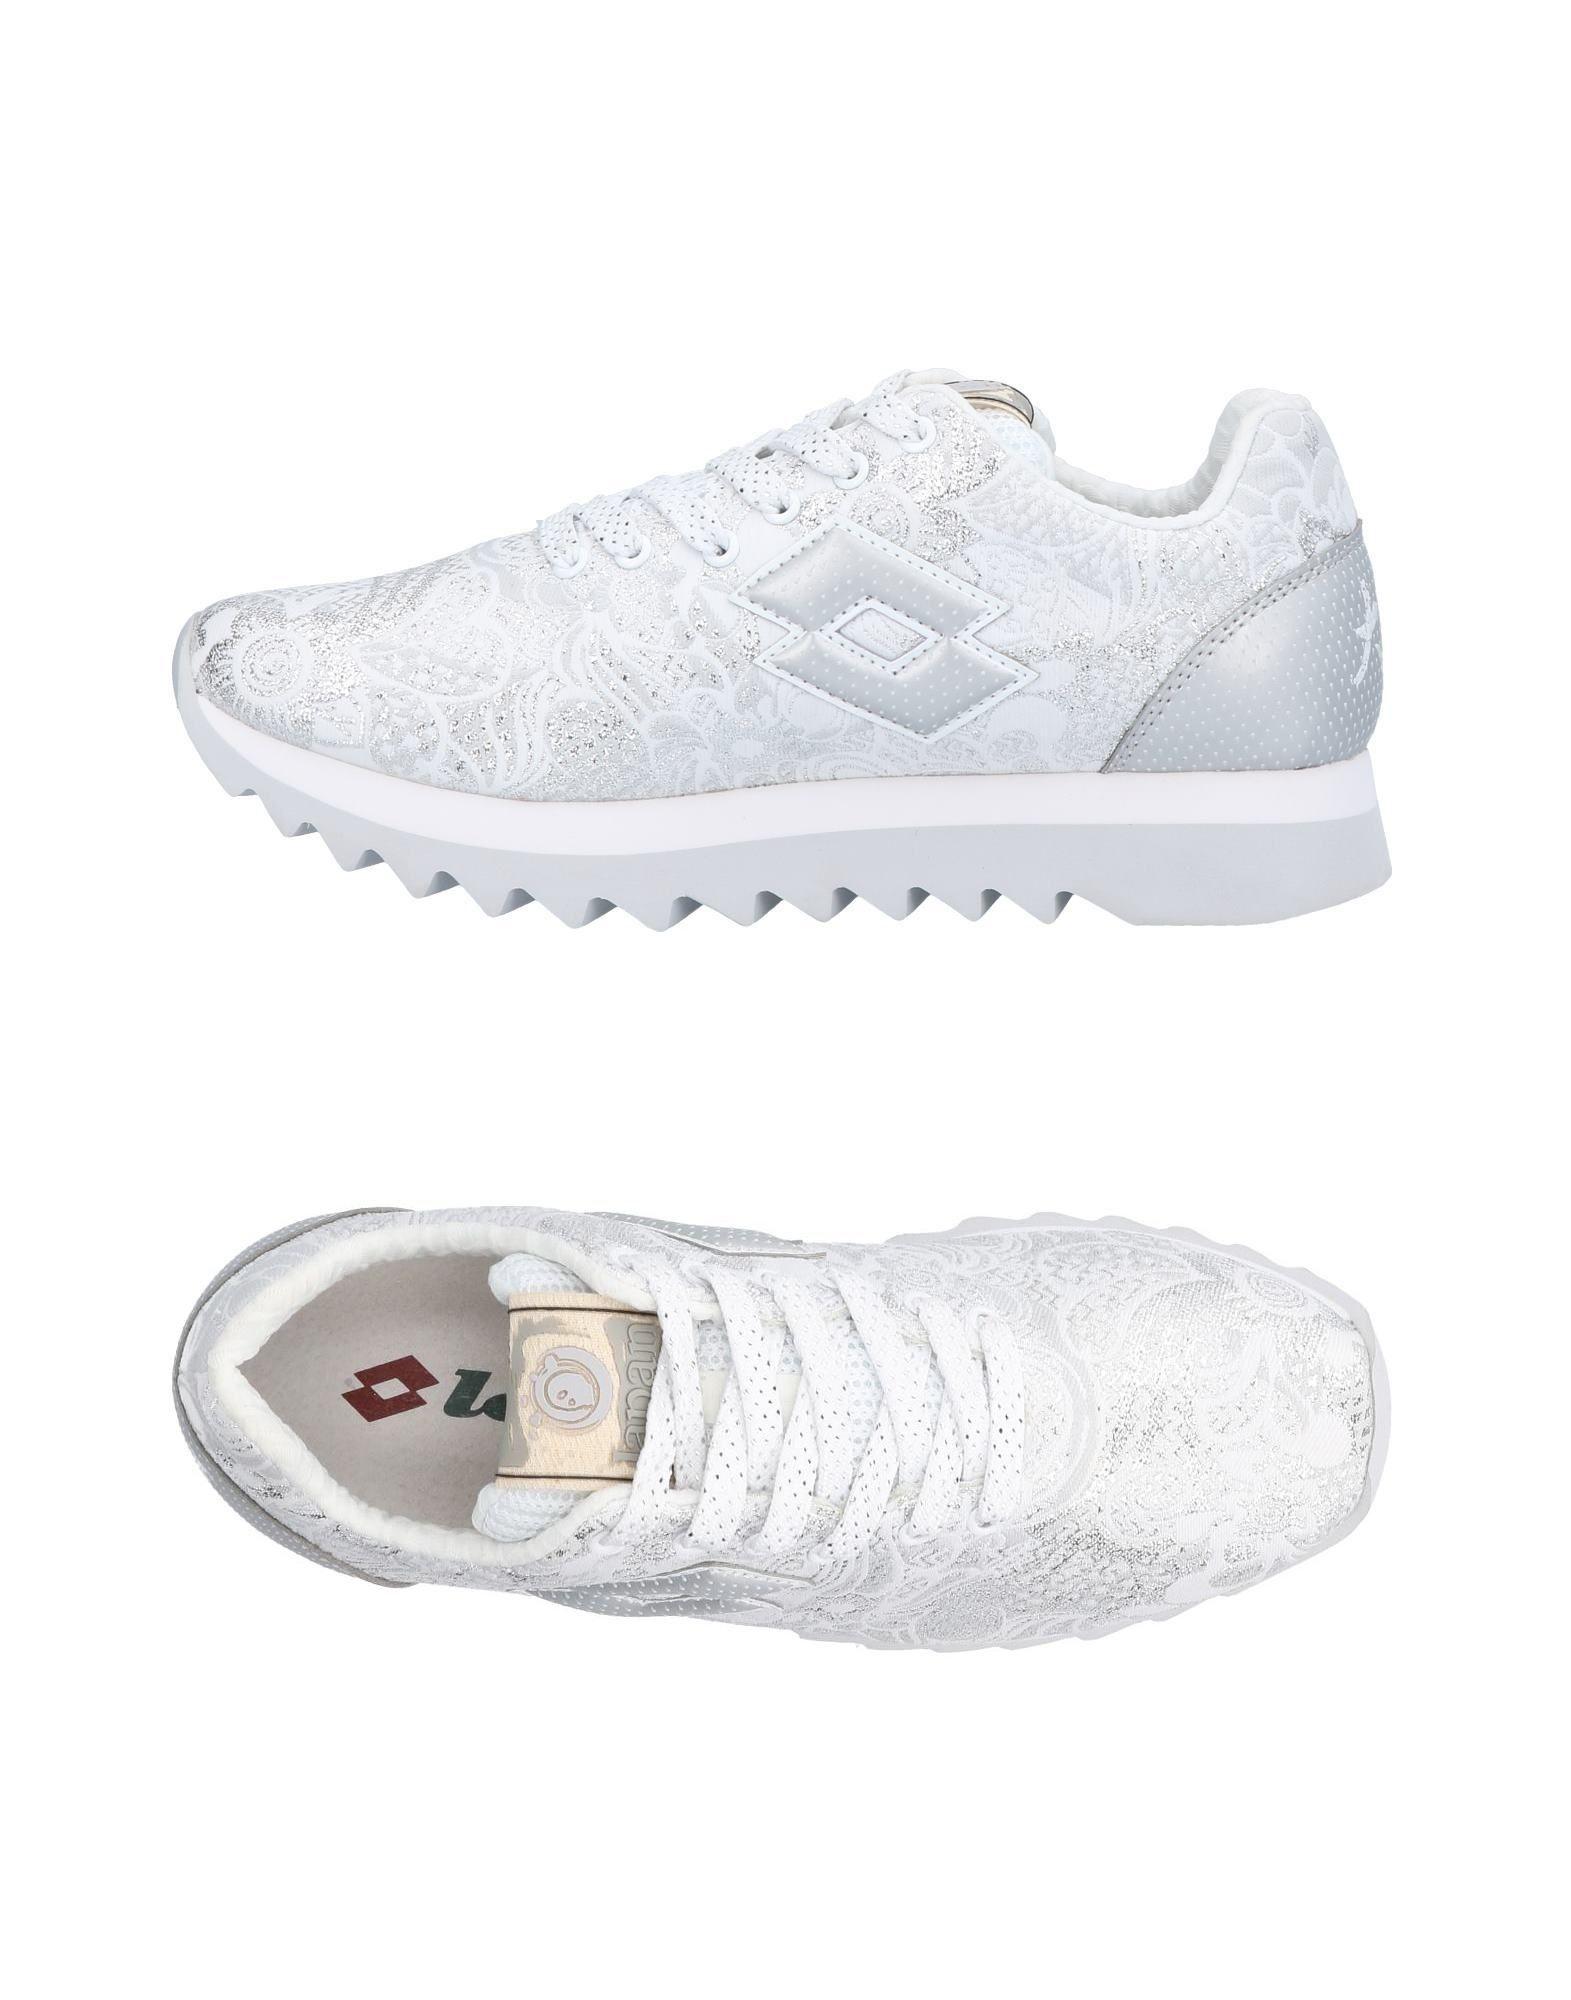 Sneakers Lotto Leggenda Femme - Sneakers Lotto Leggenda sur